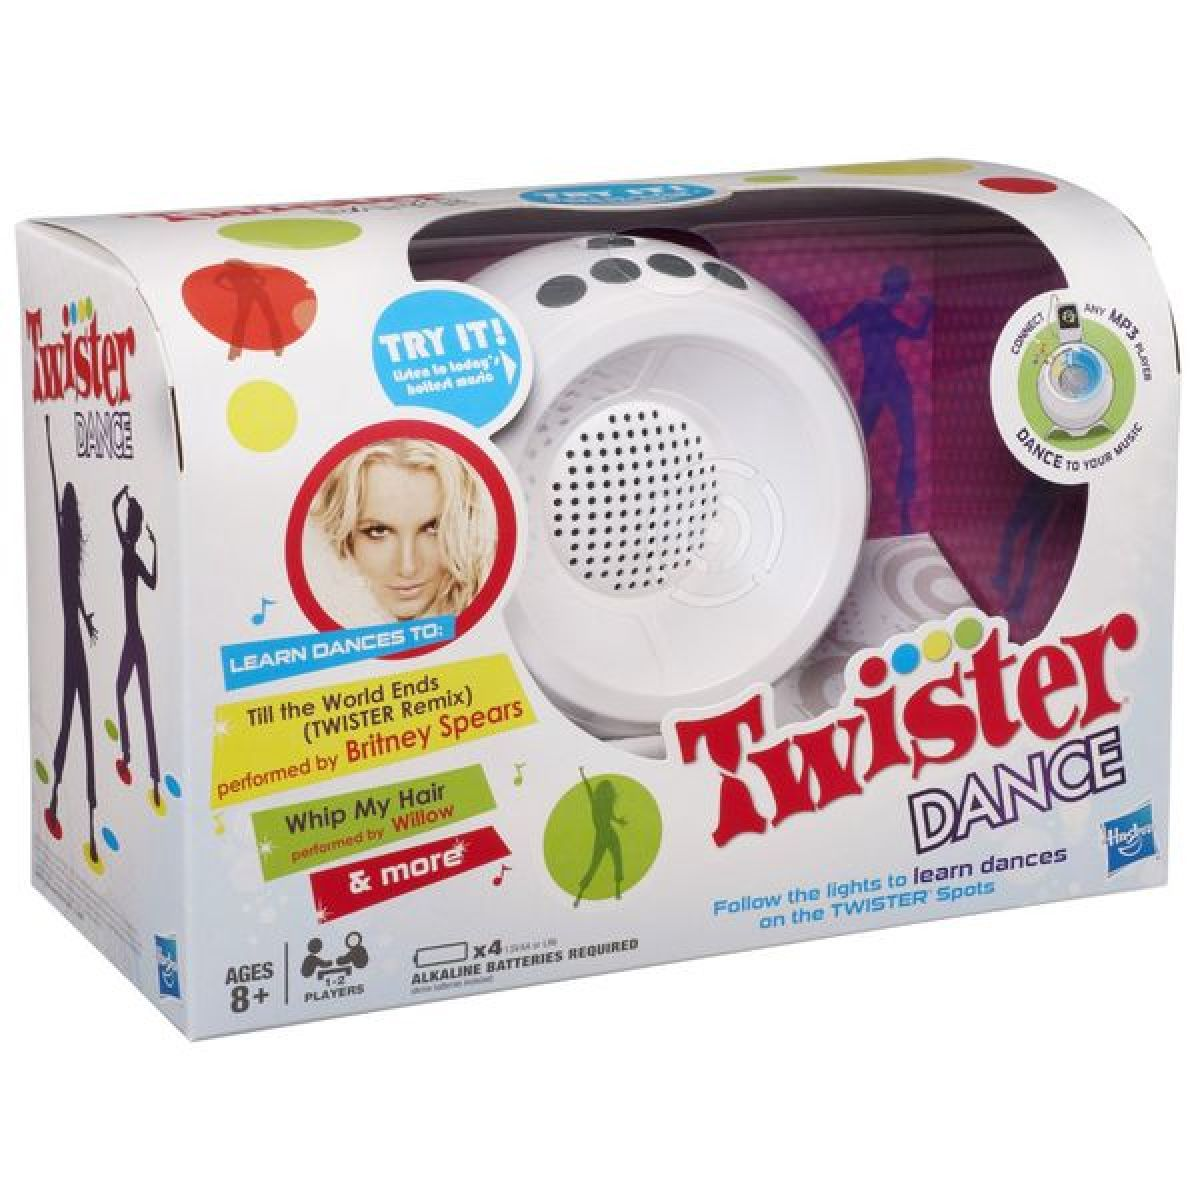 Twister Dance Hasbro 98830